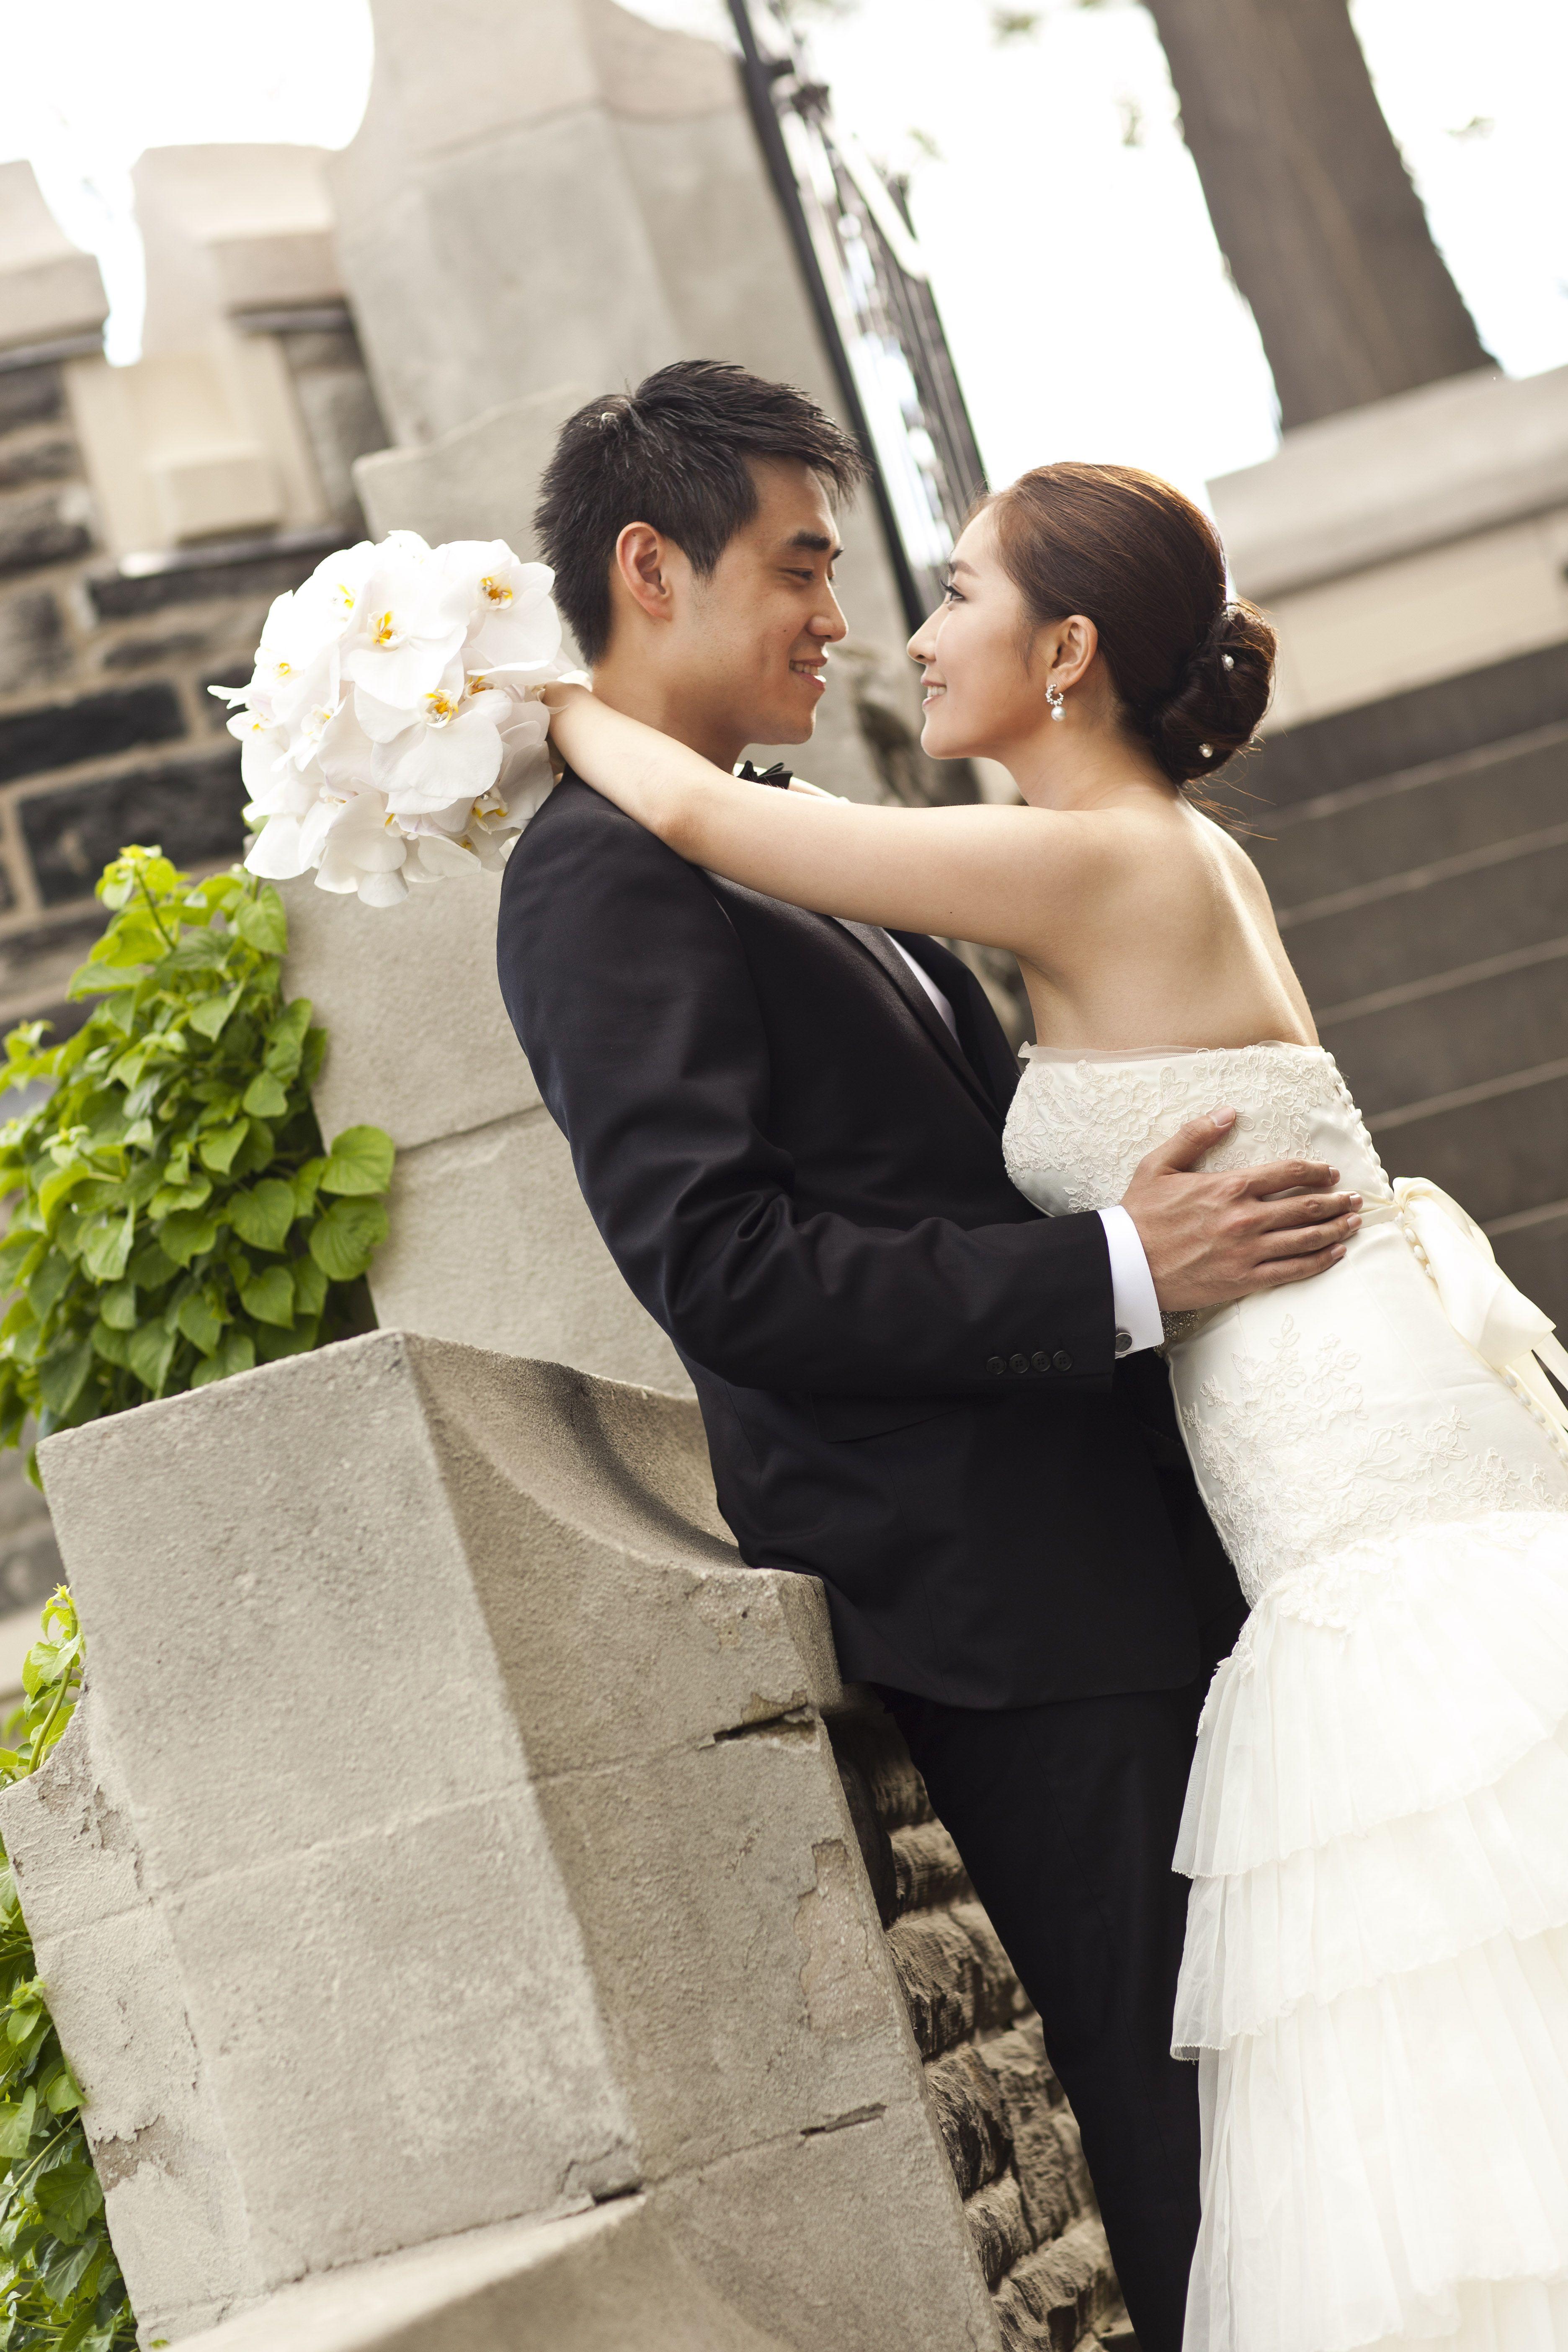 Casa loma wedding emily and blake more love from casa loma